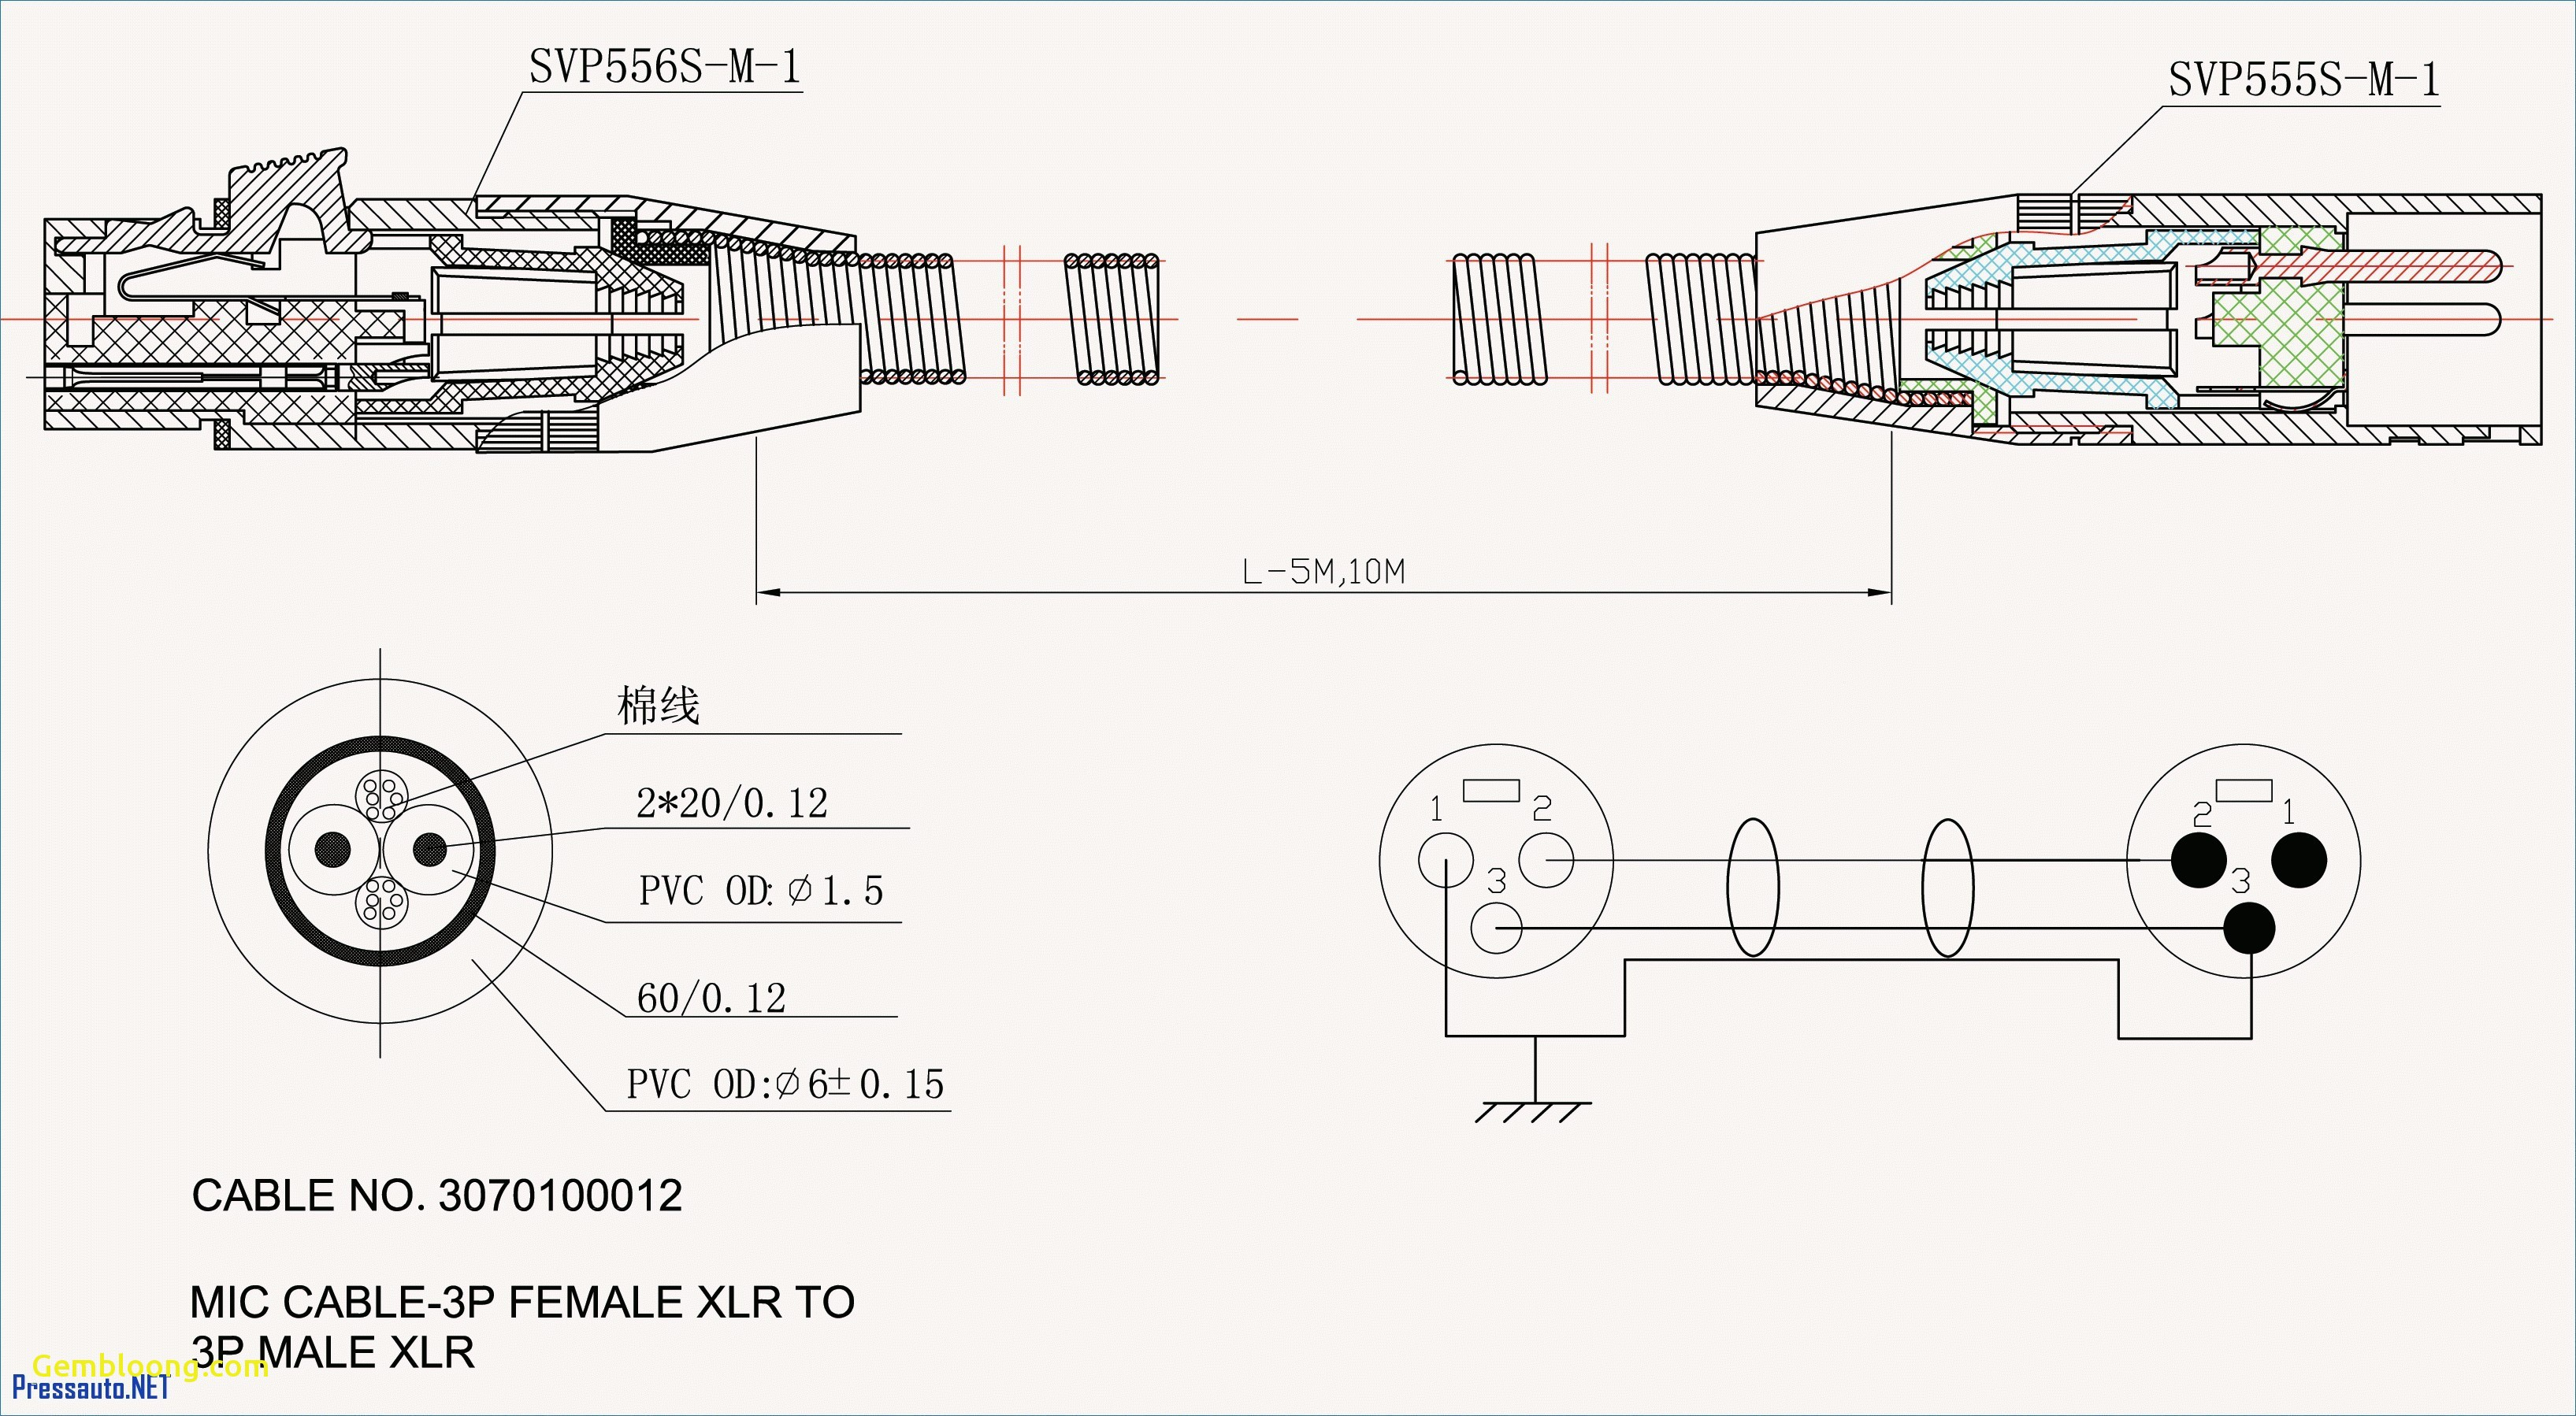 Diagram Of Cooling System for Engine ford Aerostar Engine Diagram 2000 ford Ranger 3 0 Heater Hose Of Diagram Of Cooling System for Engine